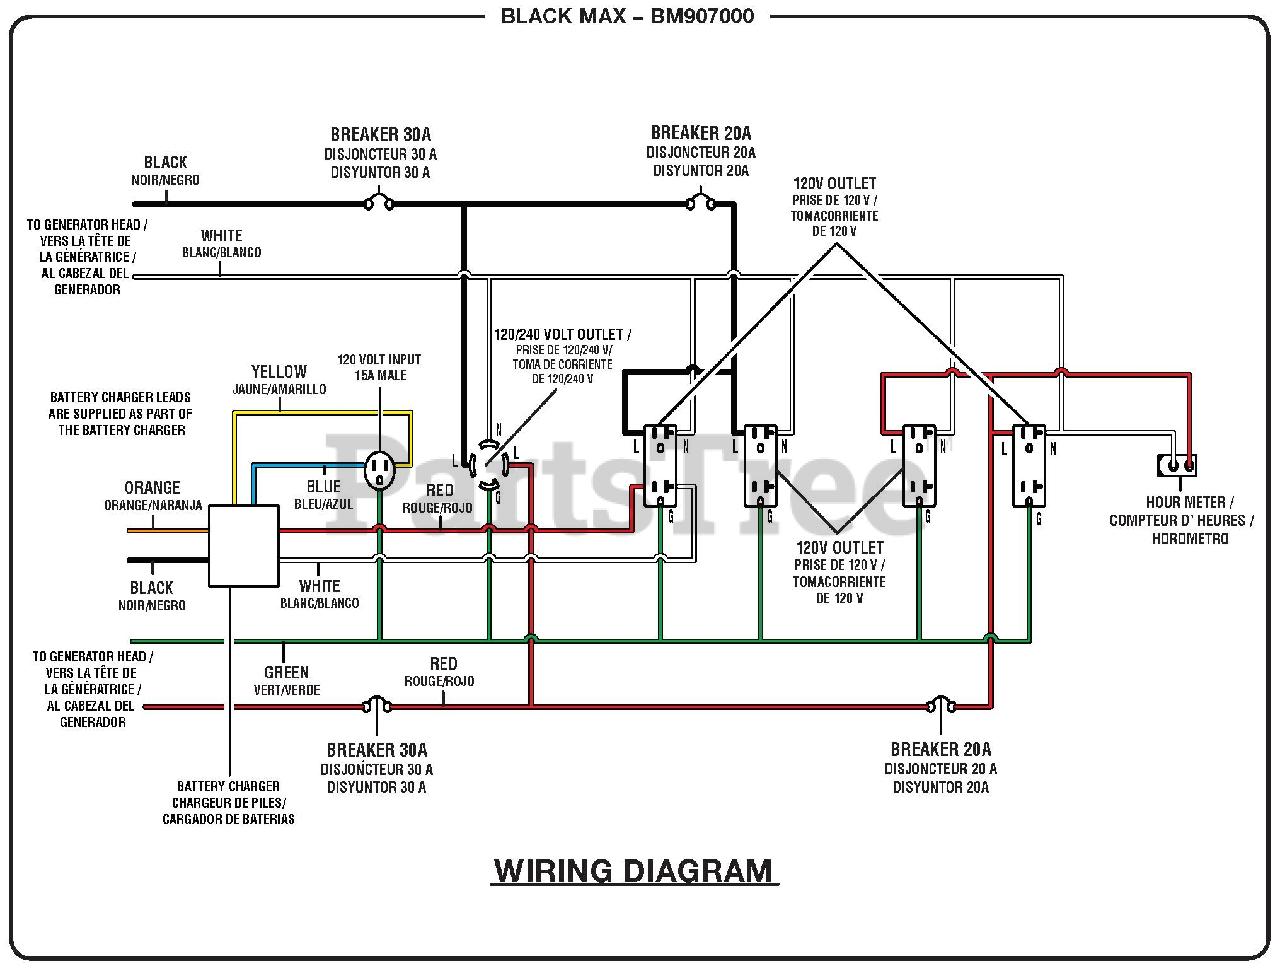 Diagram Mercury Black Max Wiring Diagram Full Version Hd Quality Wiring Diagram Diagramsbortz Horseponyclub It